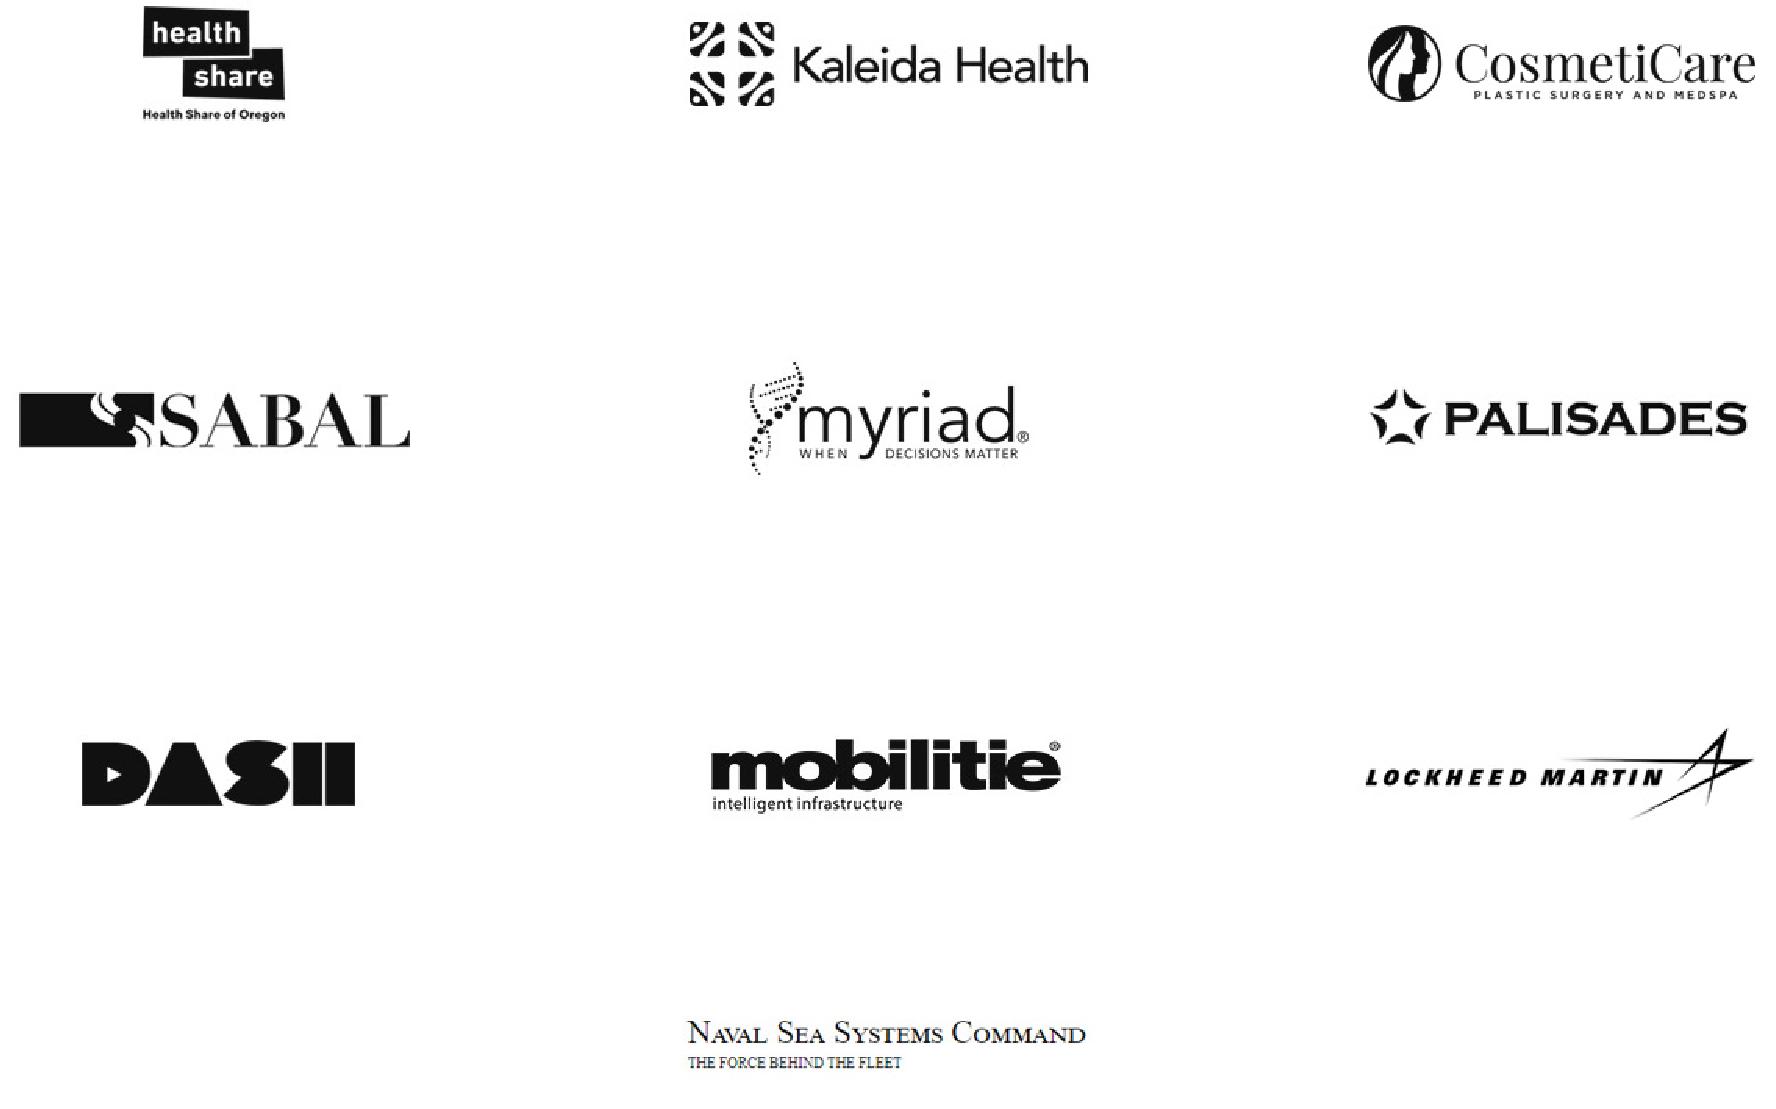 Clint Logos - Grid View